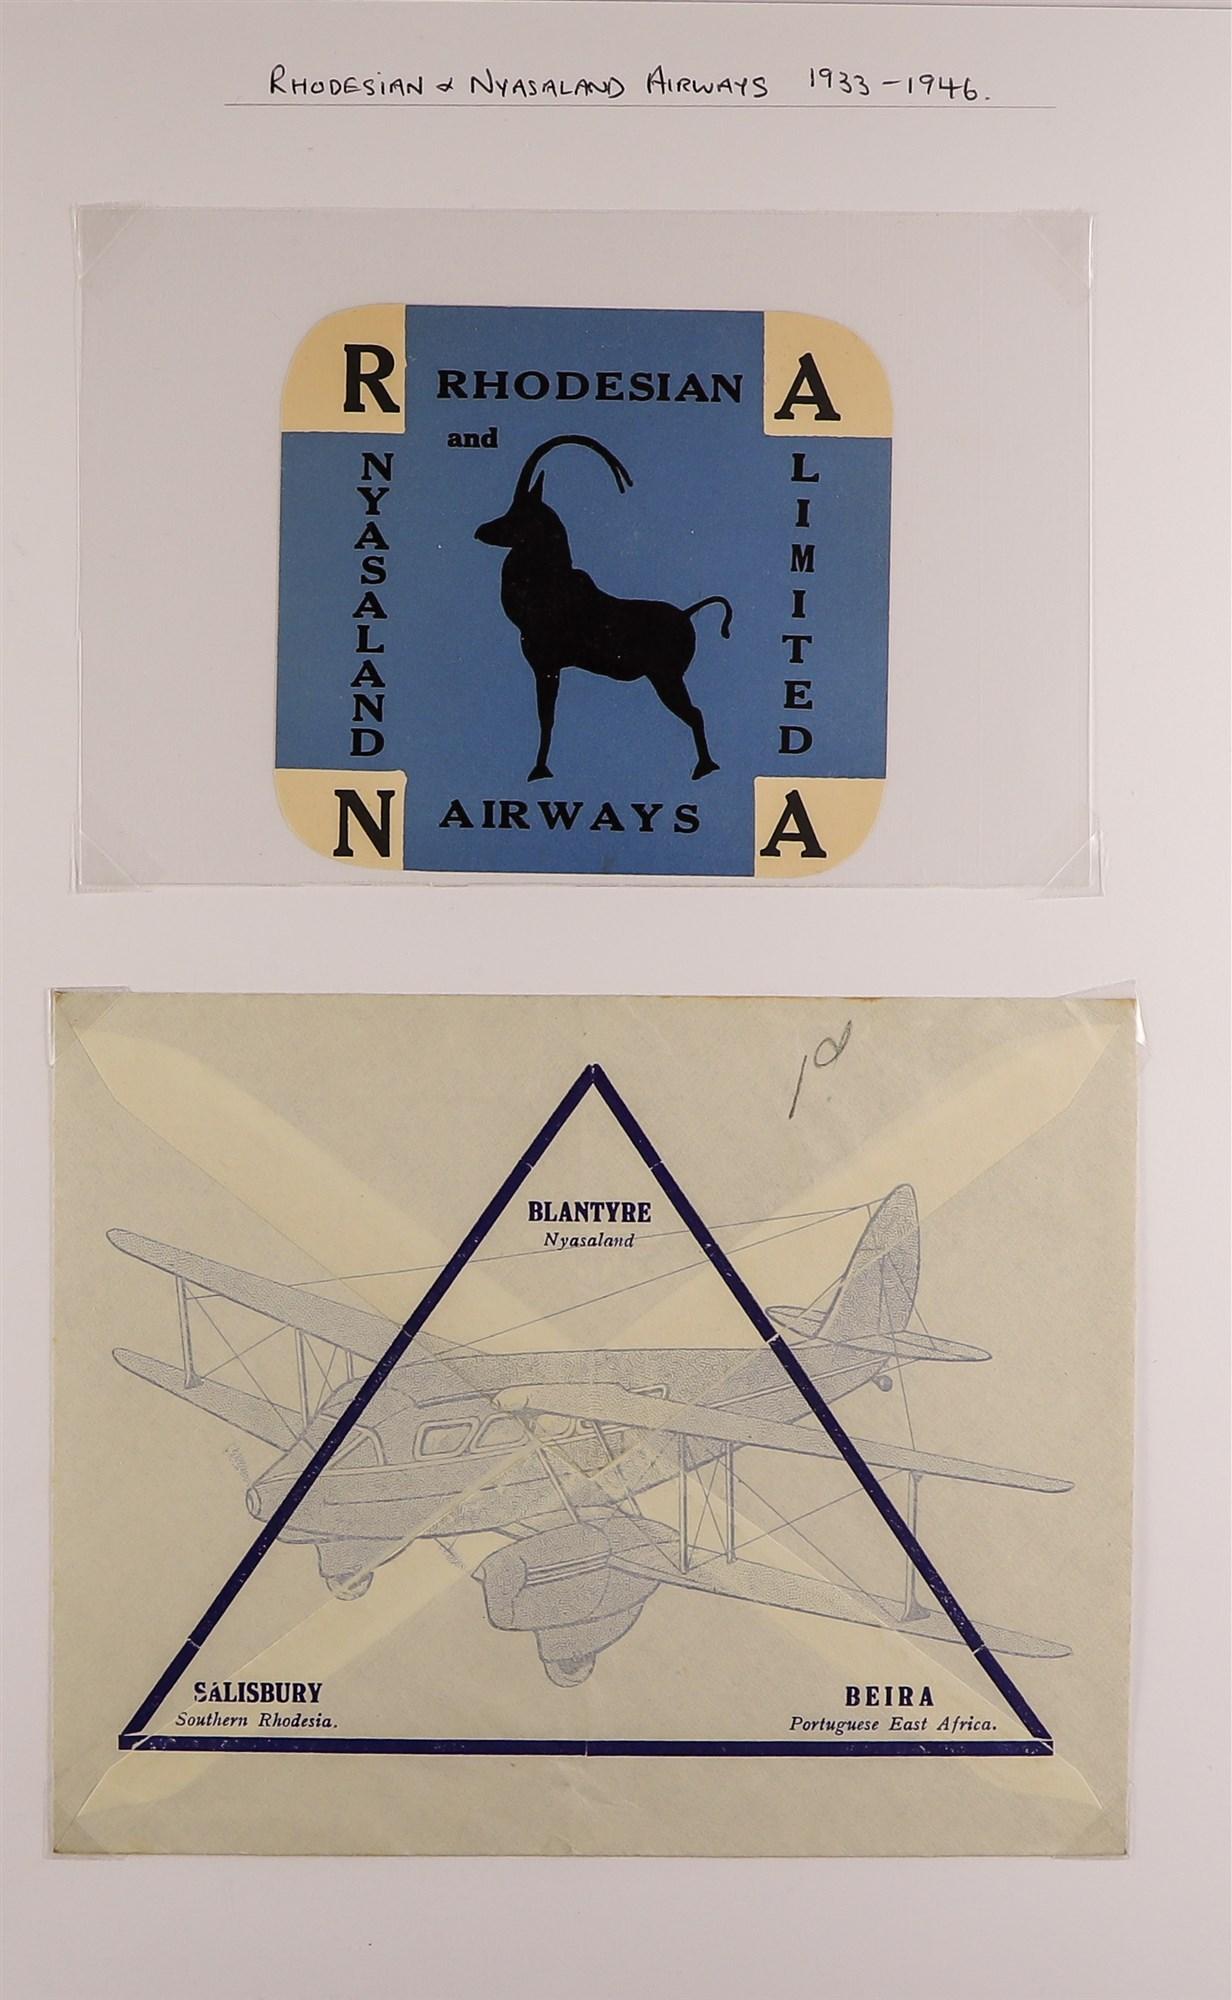 RHODESIA AIRMAIL COVERS COLLECTION 1930's-60's with Rhodesian & Nyasaland Airways (15), Nyasaland- - Image 10 of 10